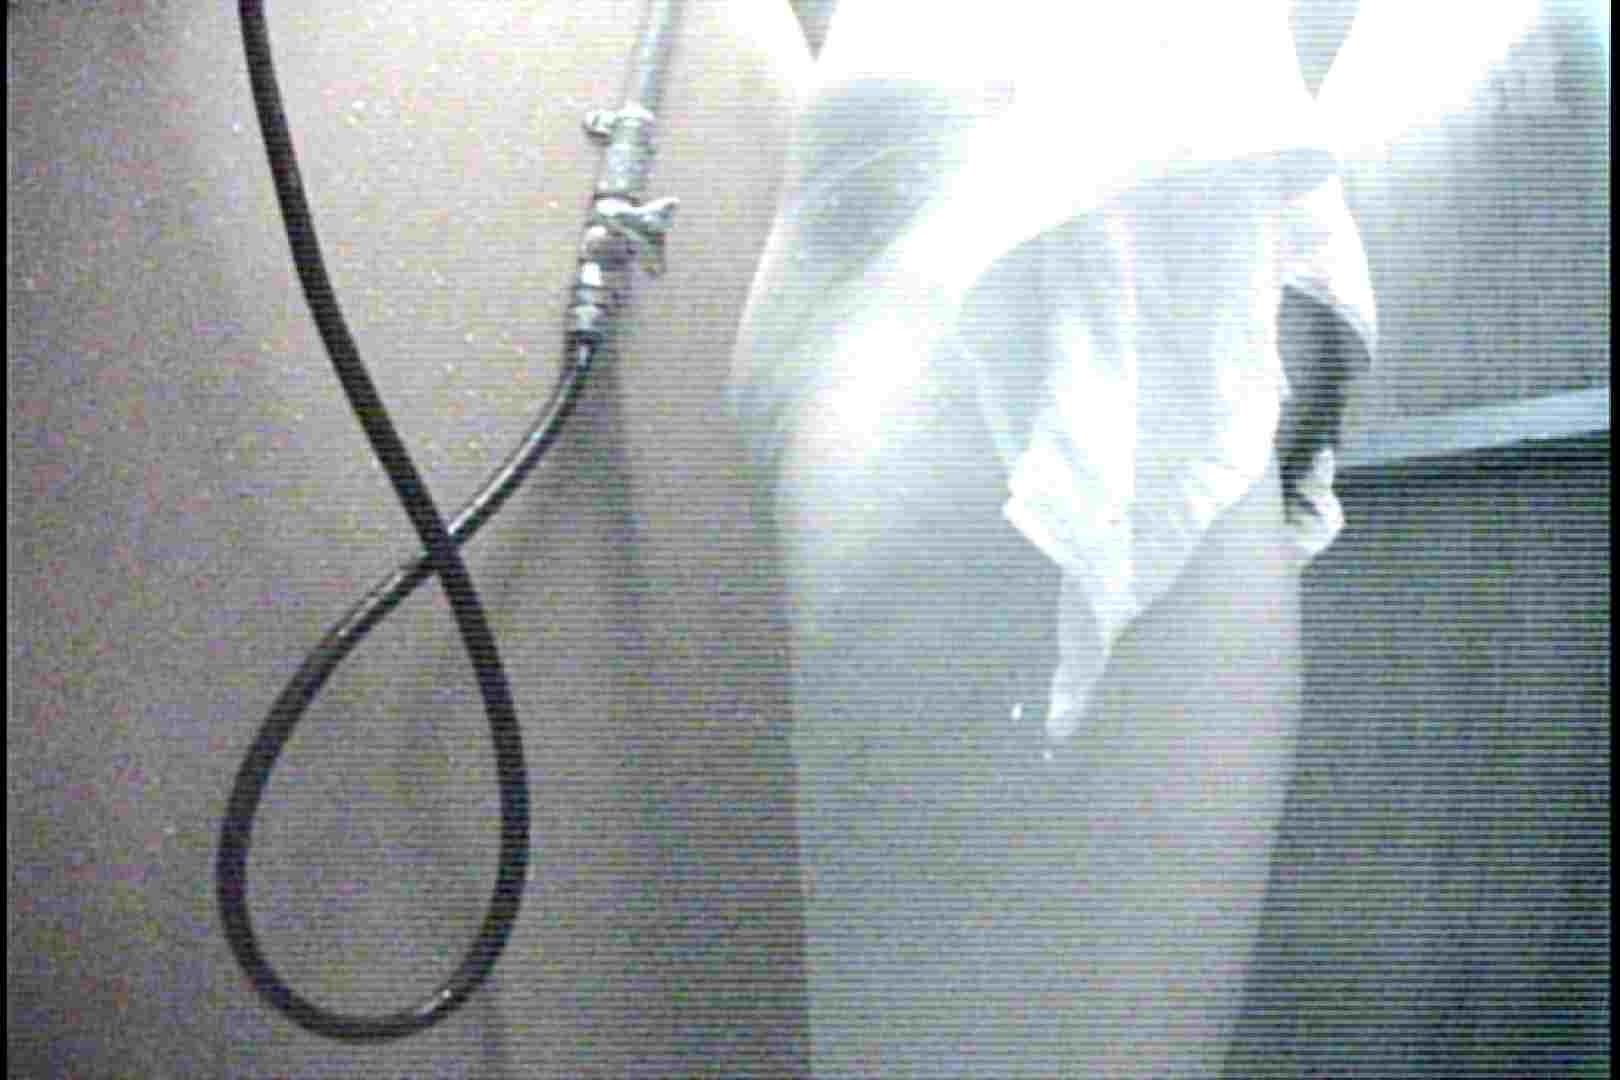 File.41 ムチムチギャル、大迫力の下半身 素人 盗撮セックス無修正動画無料 25pic 21